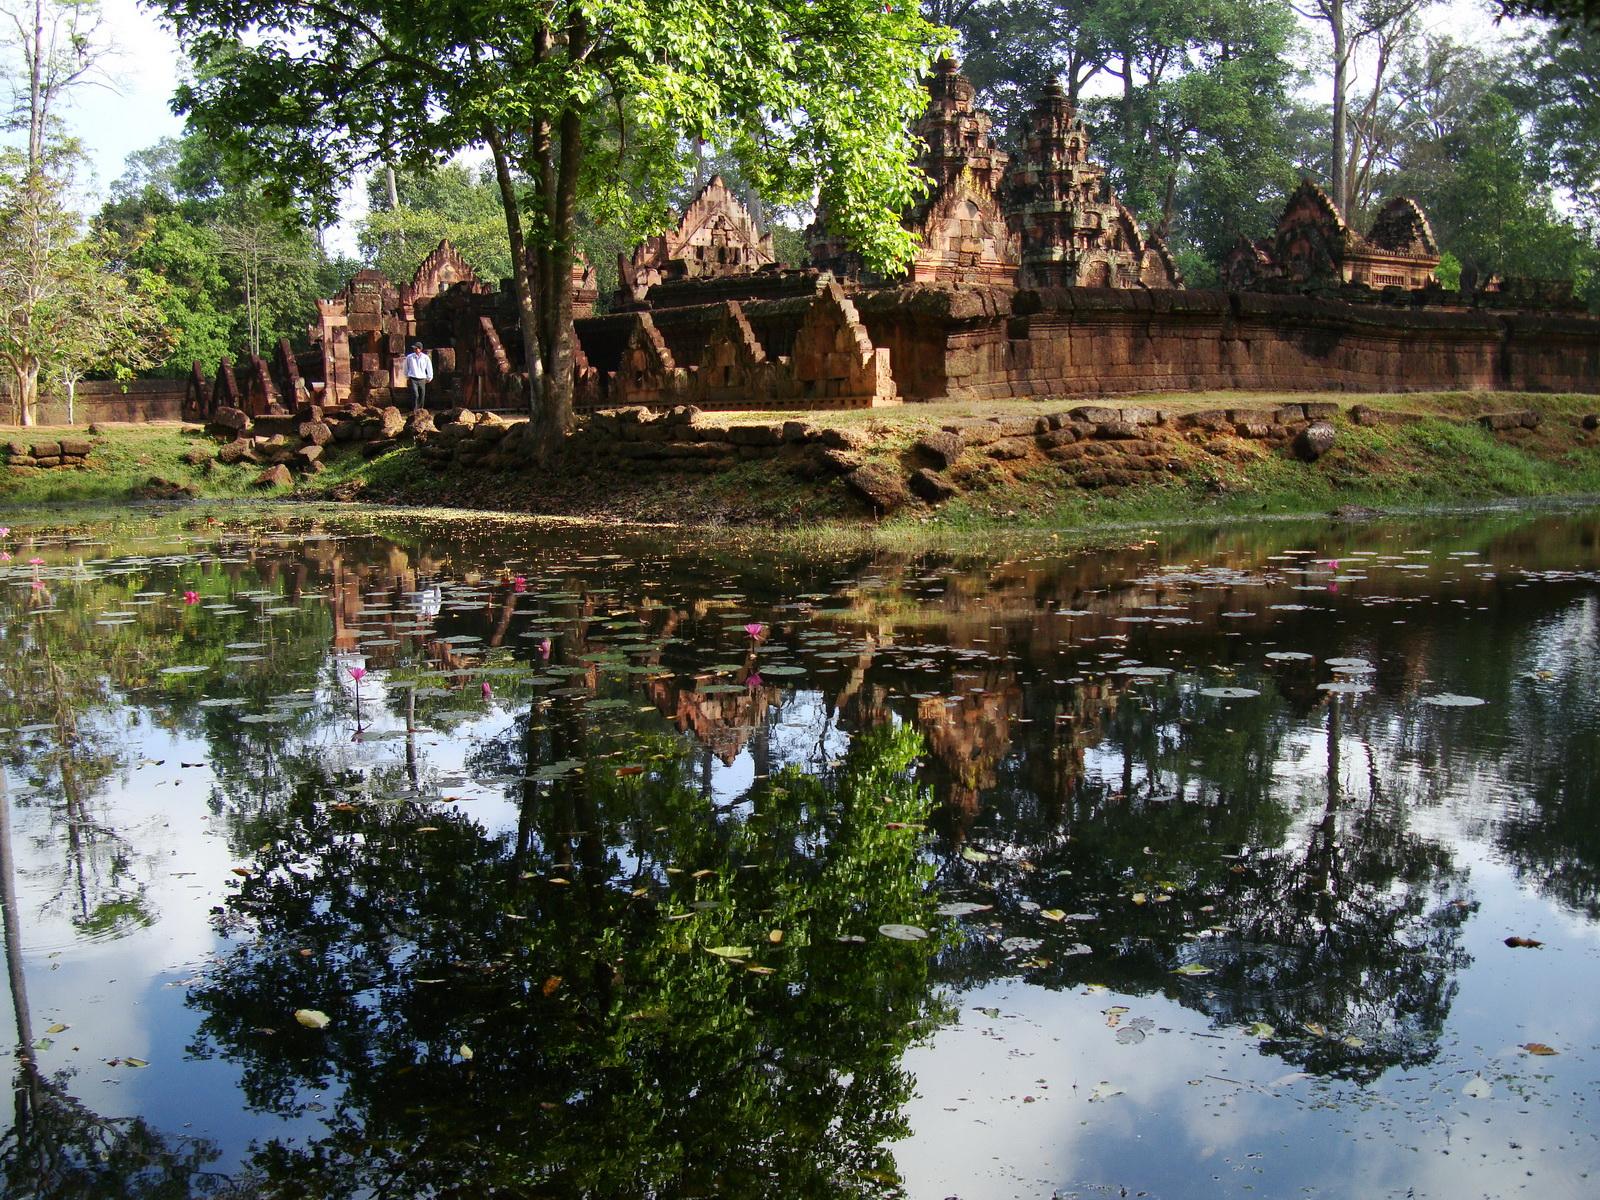 Banteay Srei 10th century Khmer architecture Tribhuvanamahesvara 10